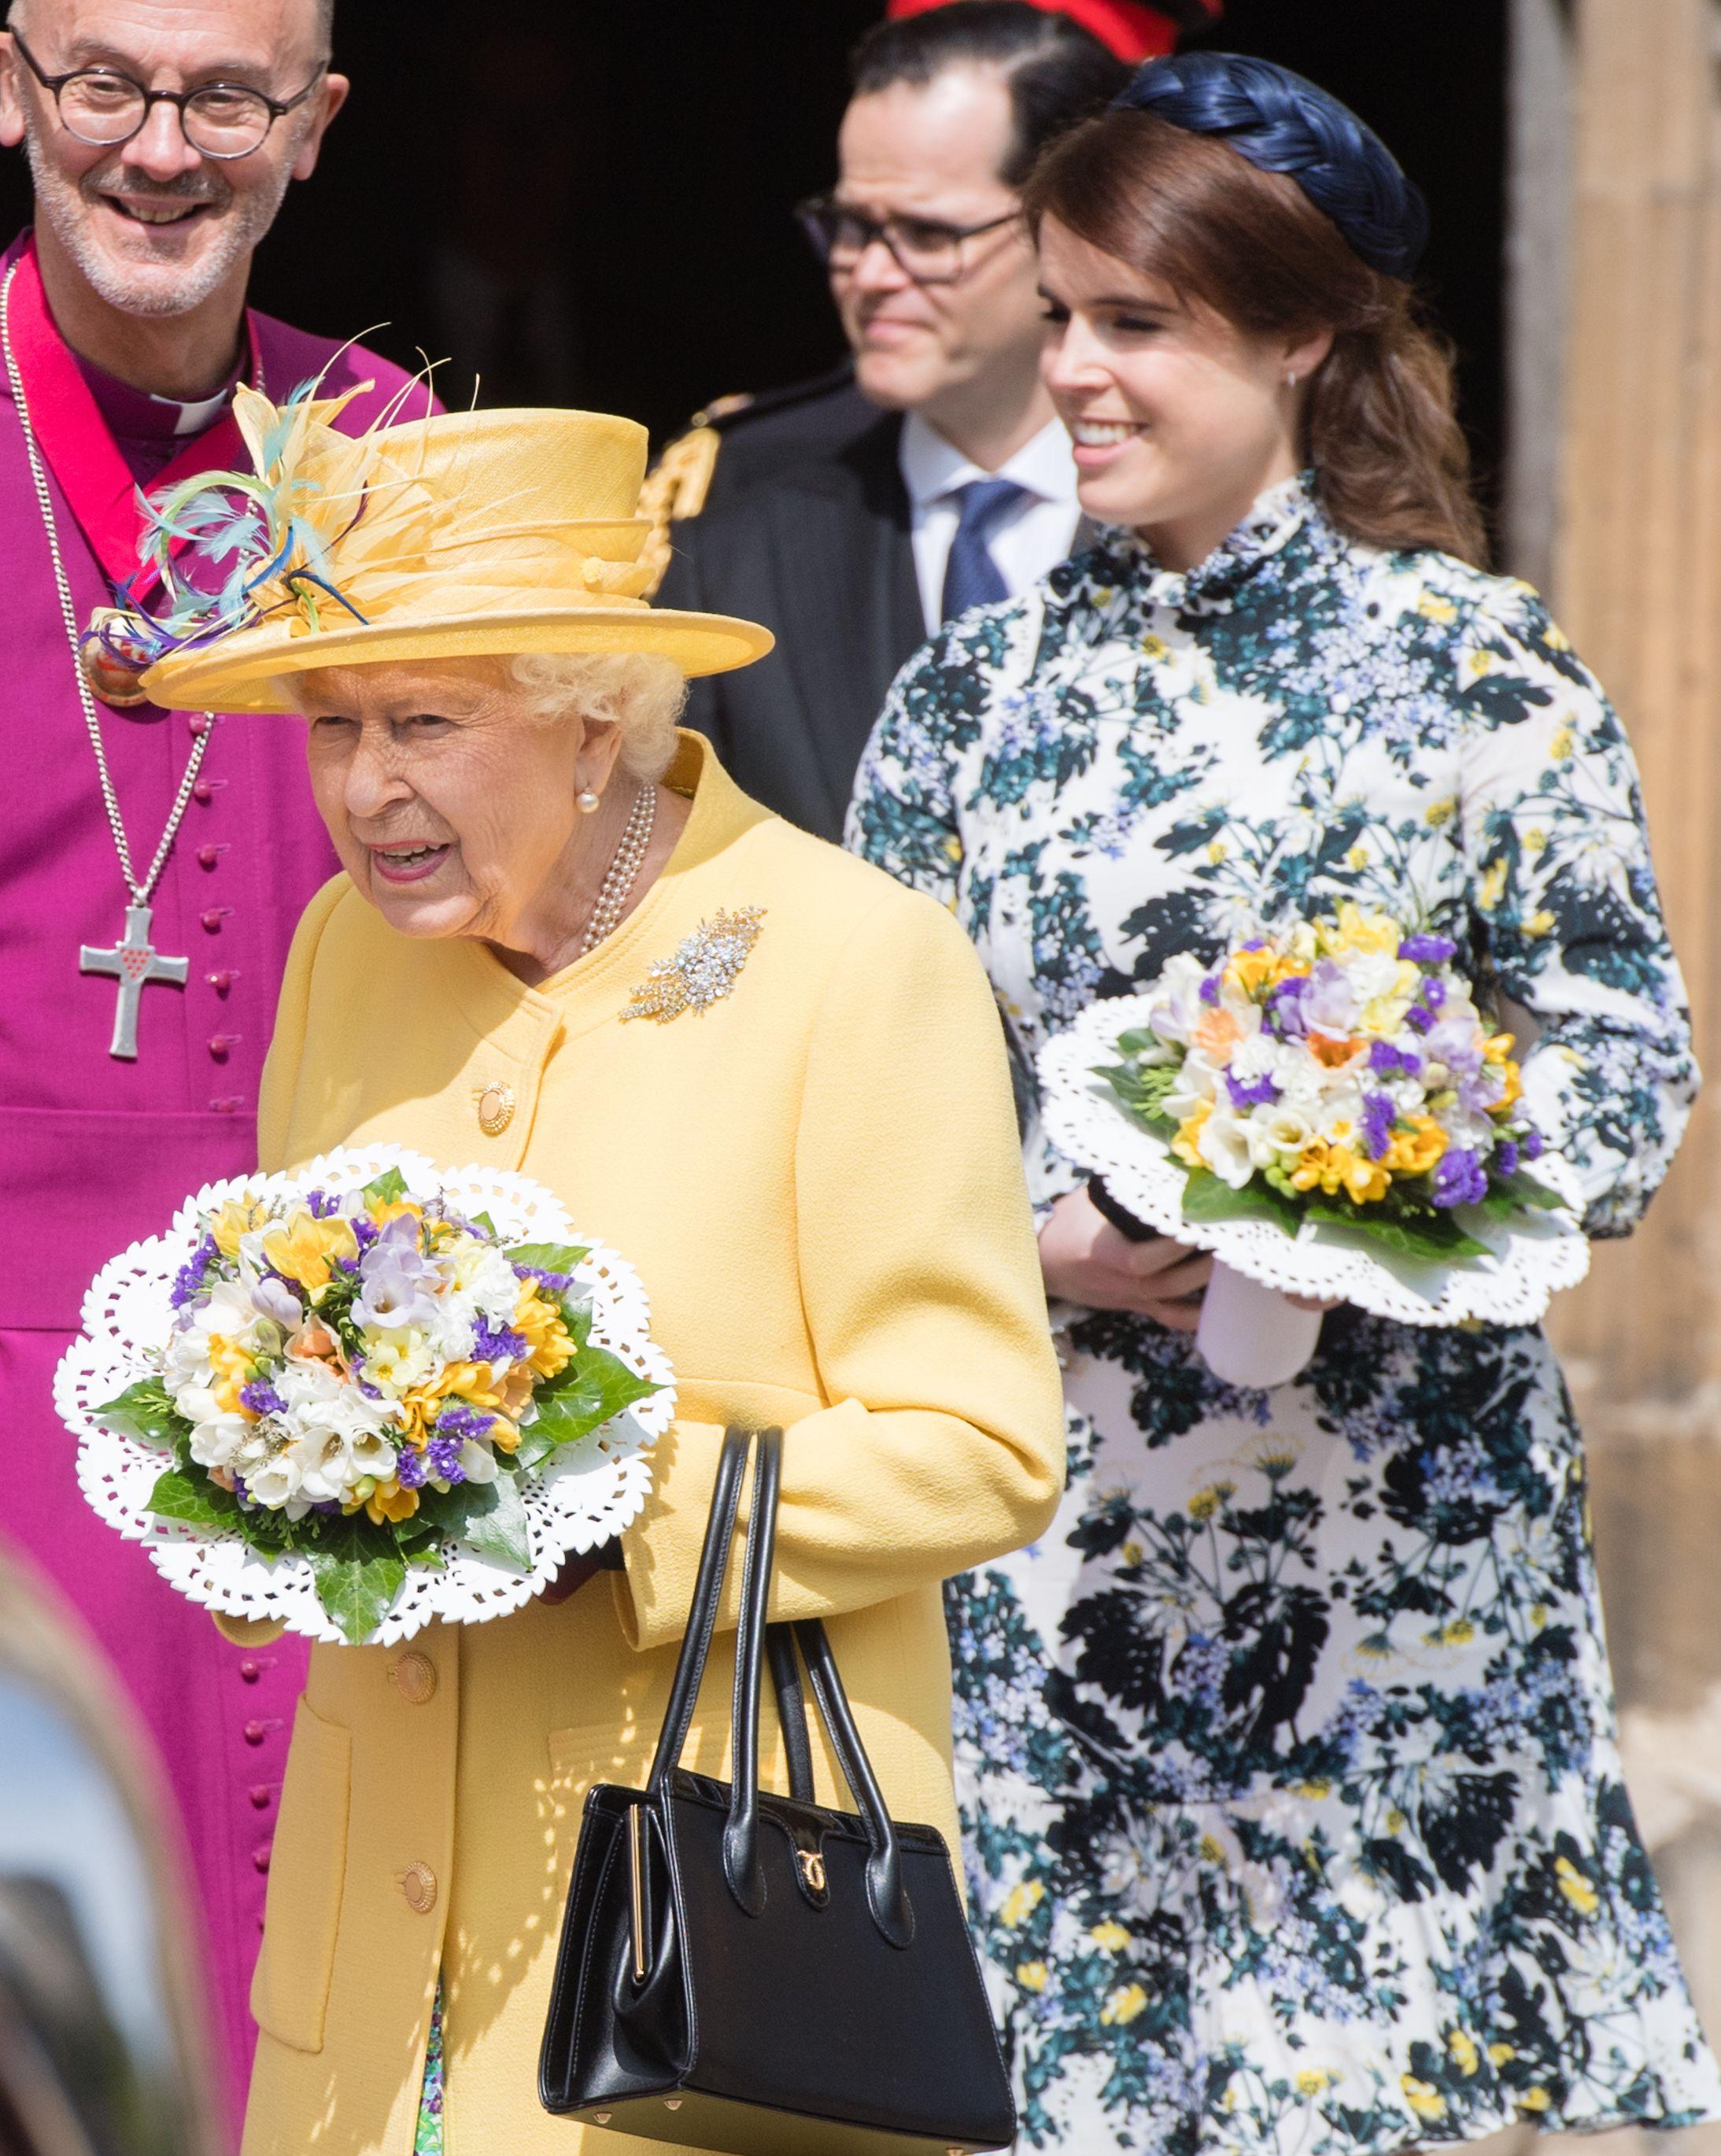 queen elizabeth princess eugenie Royal Maundy Service 2019 st georges chapel